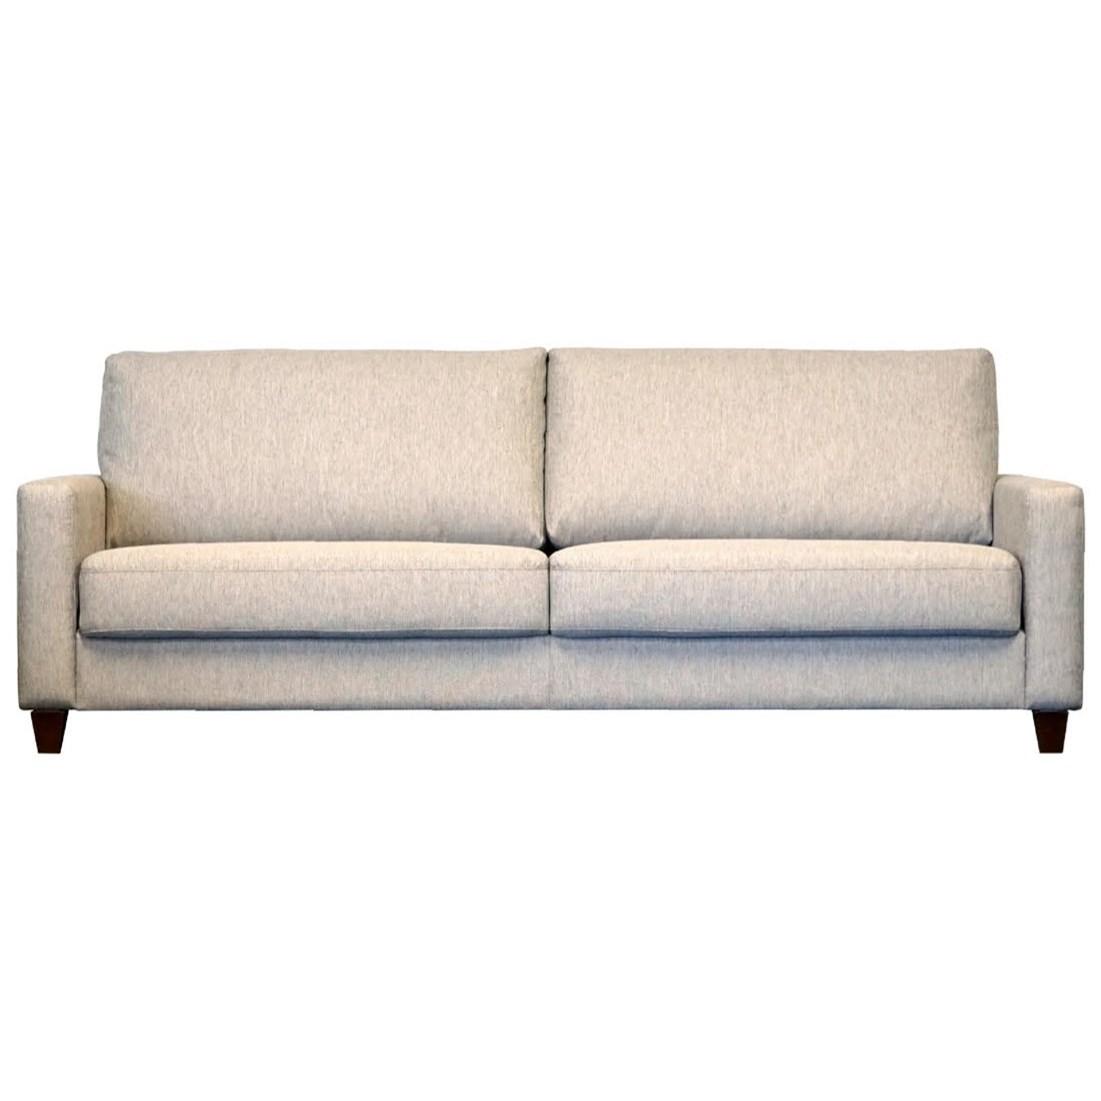 Luonto NicoKing Size Sofa Sleeper King ...